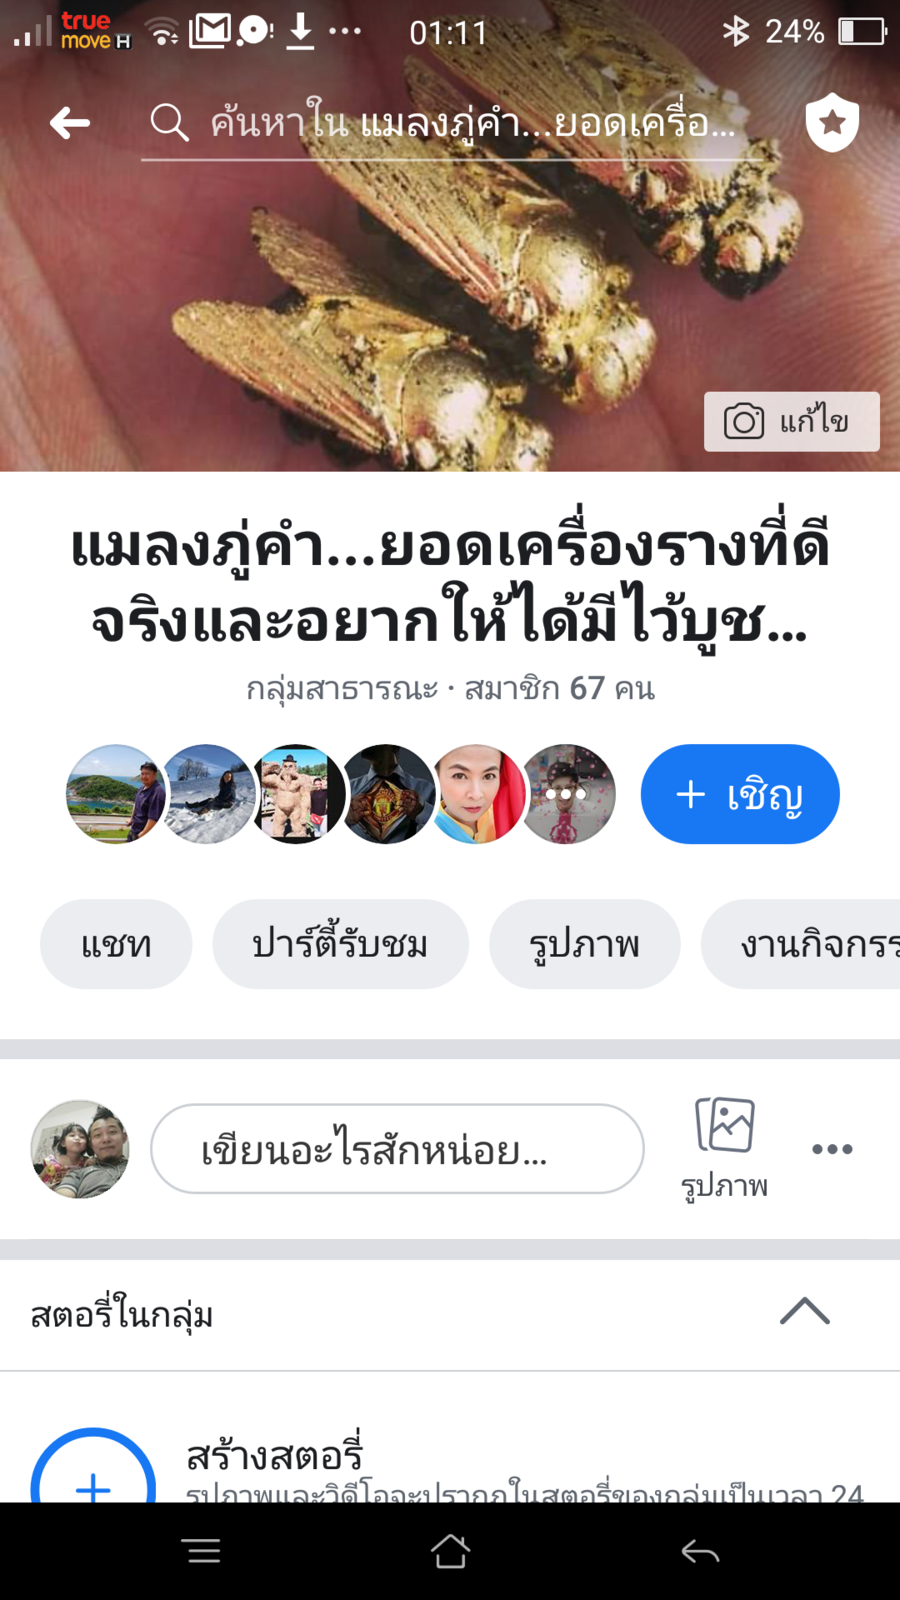 Screenshot_2019-06-17-01-11-49-53.png